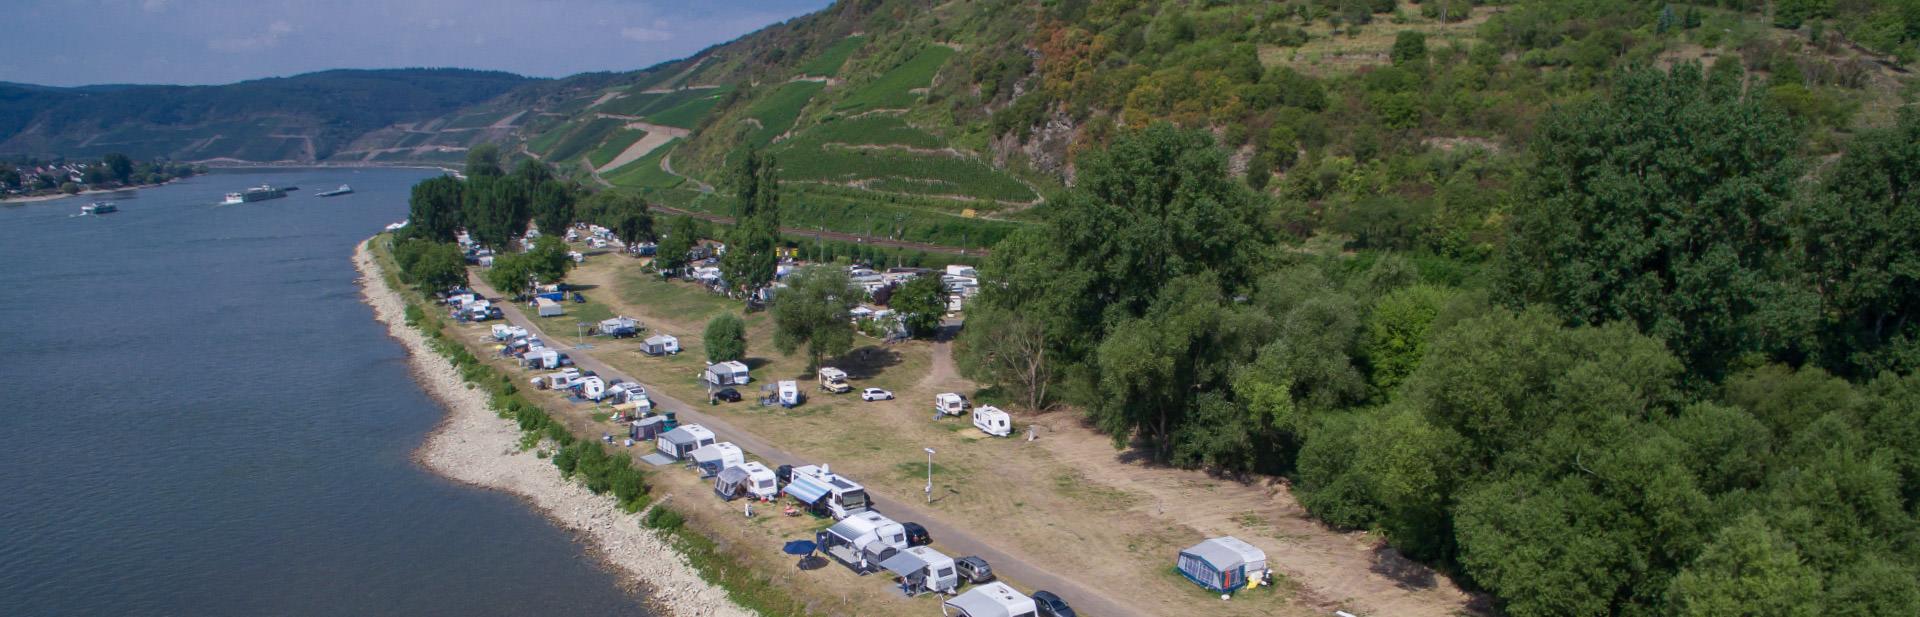 sonneneck-camping-home-slide2